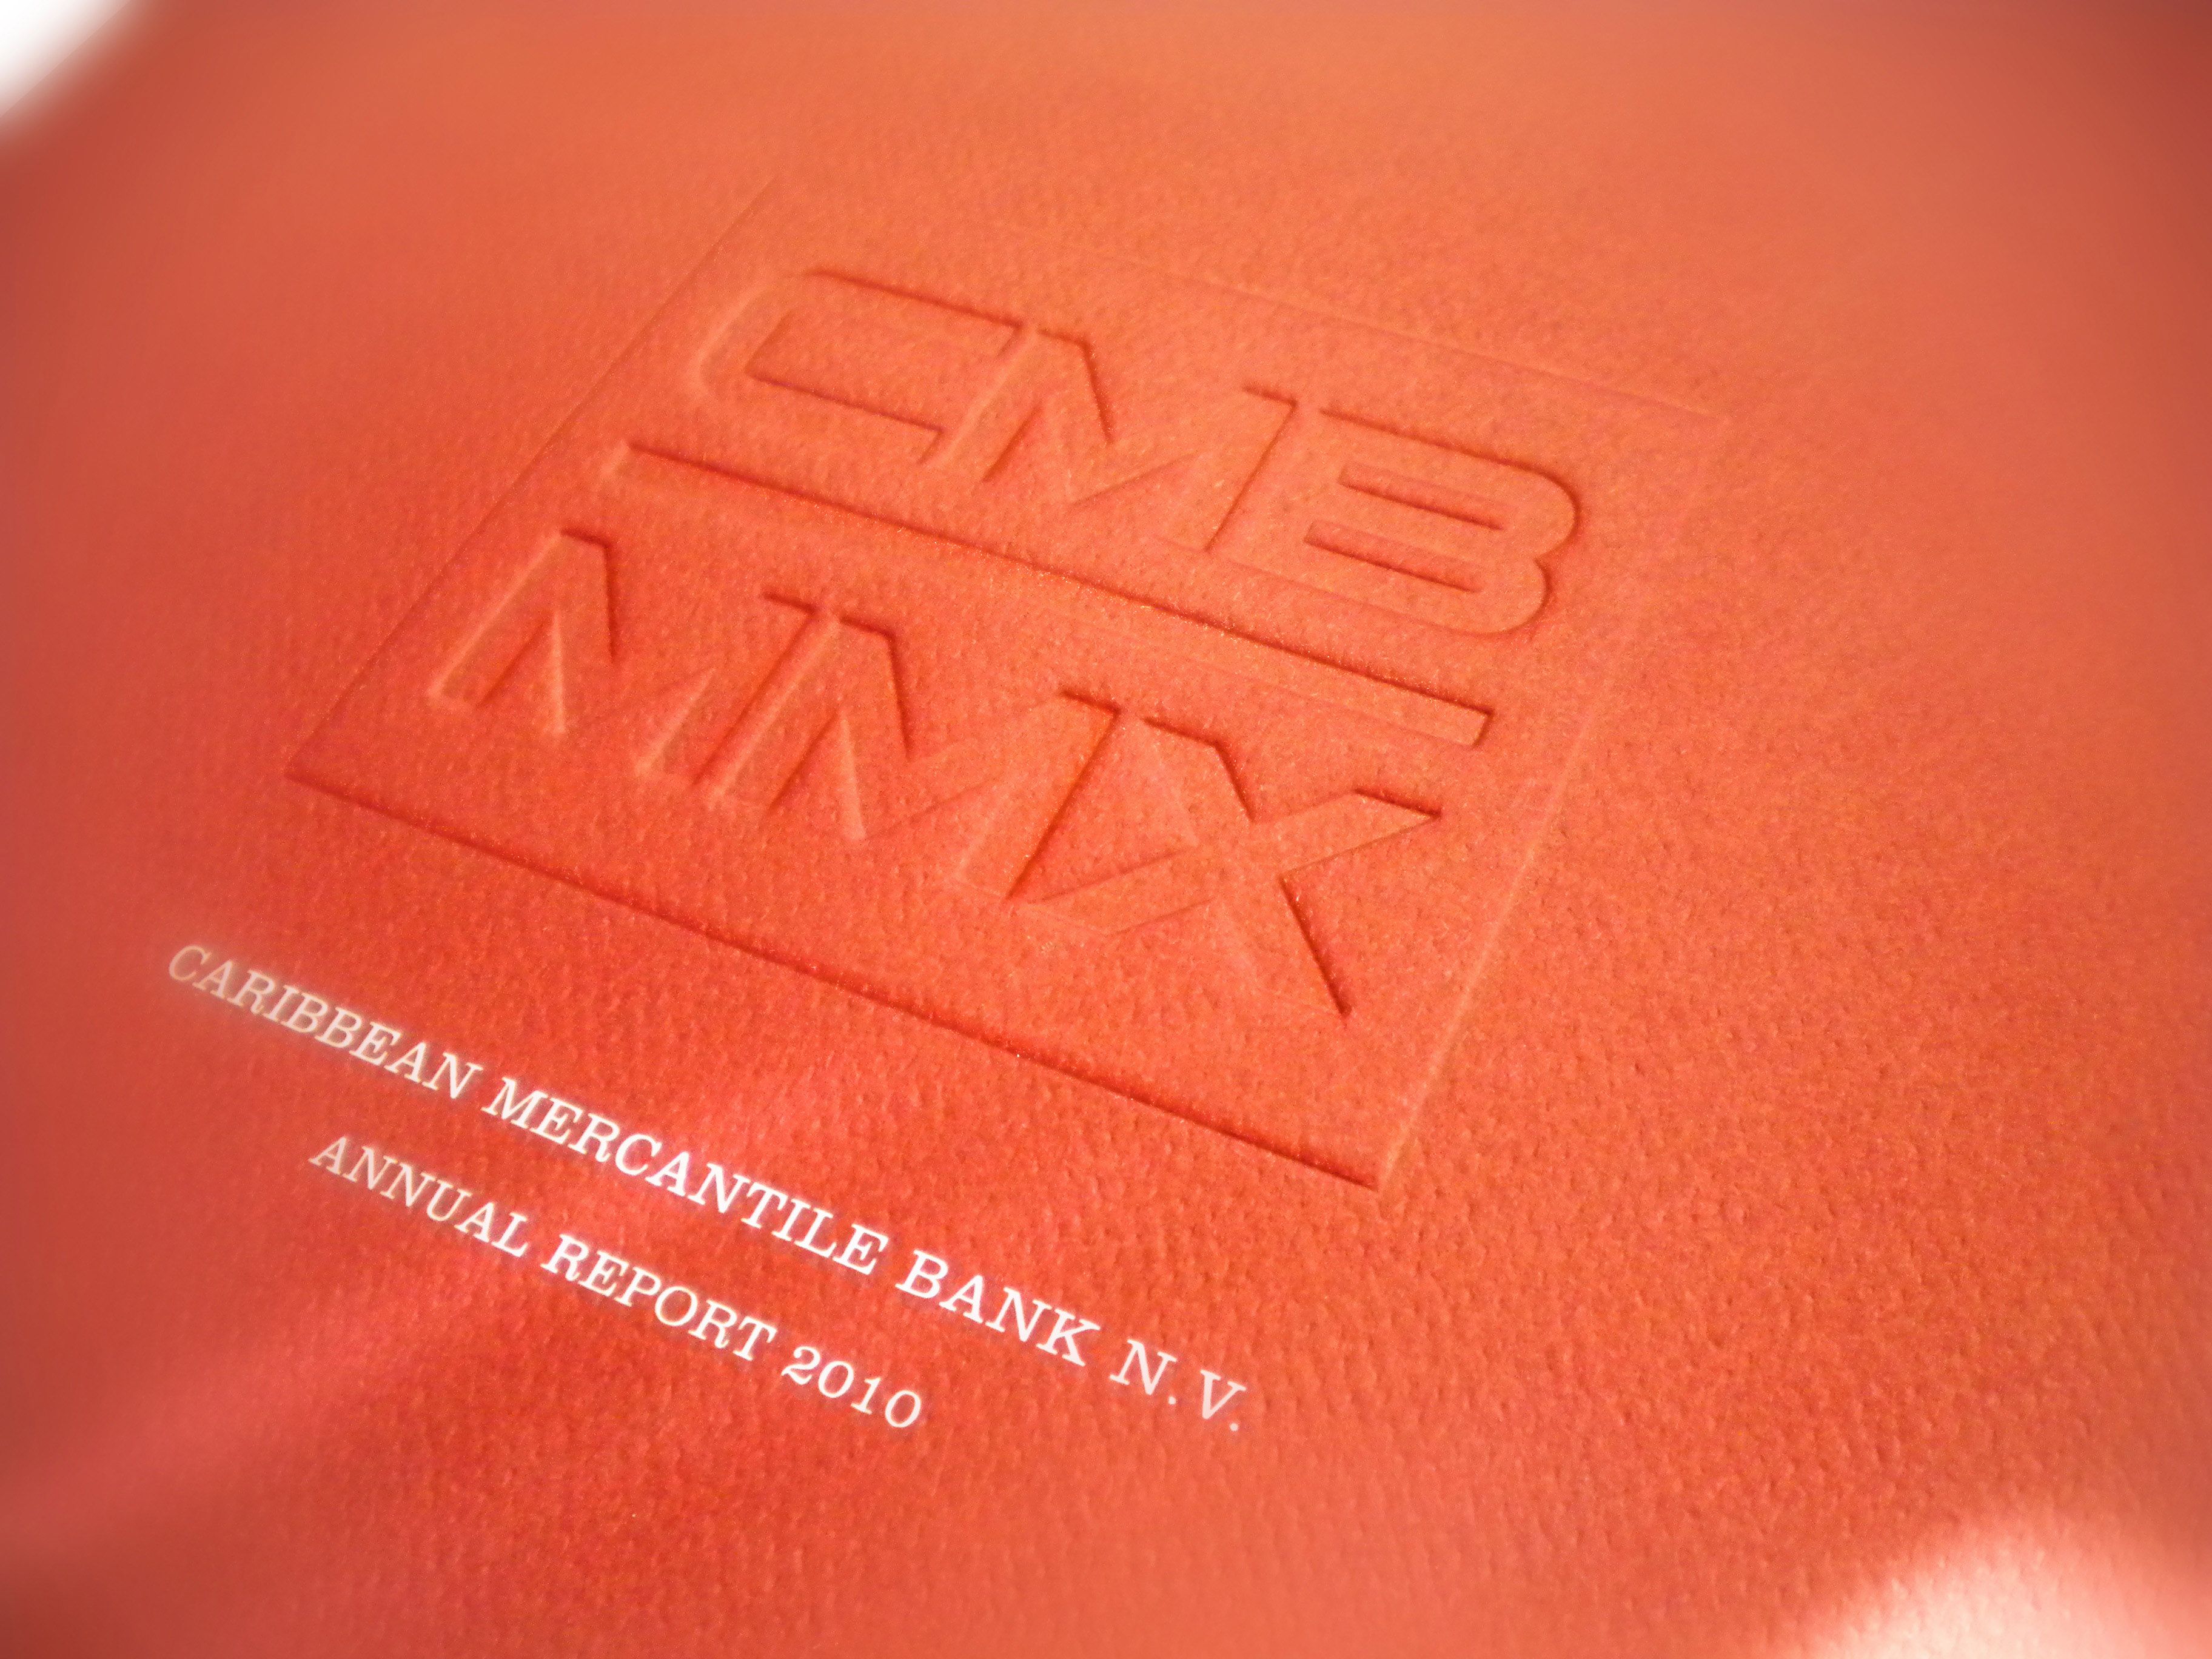 Caribbean Mercantile Bank N.V.